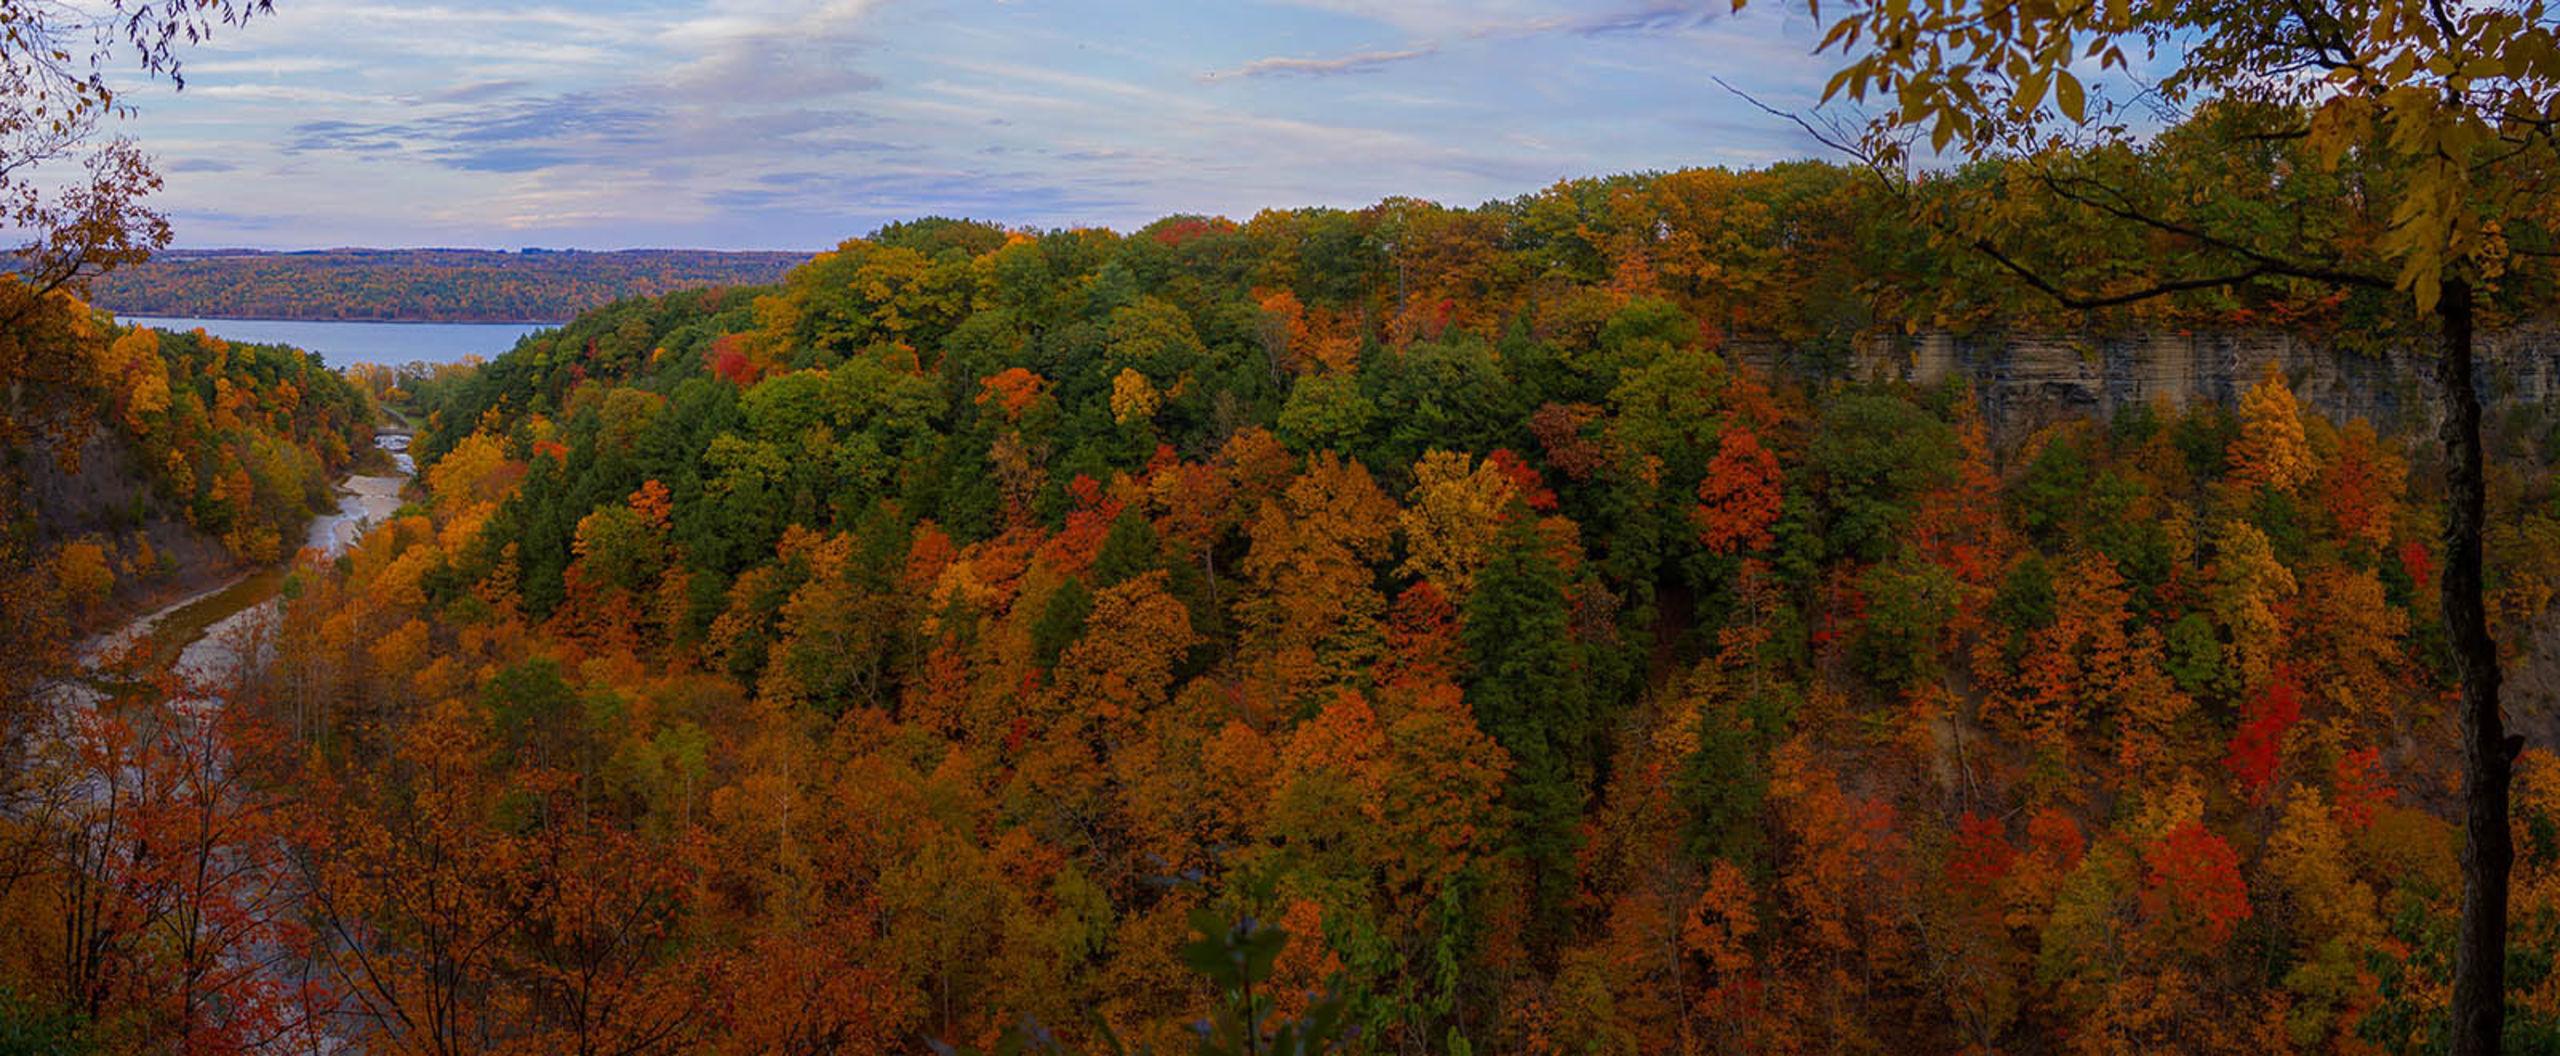 Taughannock Gorge in Autumn